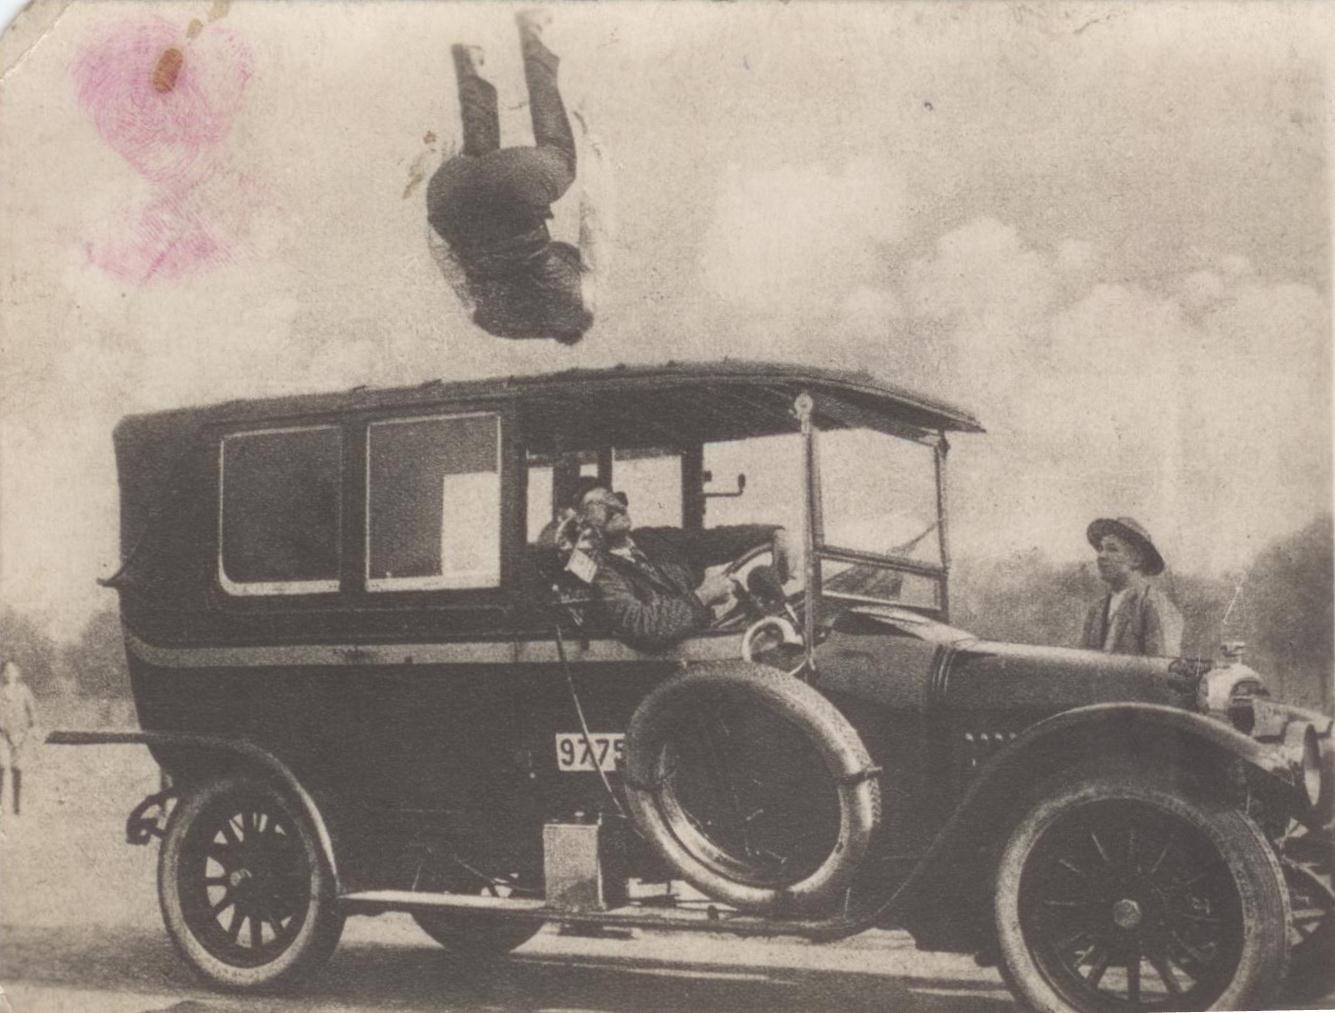 BASA_891K-1-28-1_Lazar-Dobrich,1908,Bordeaux